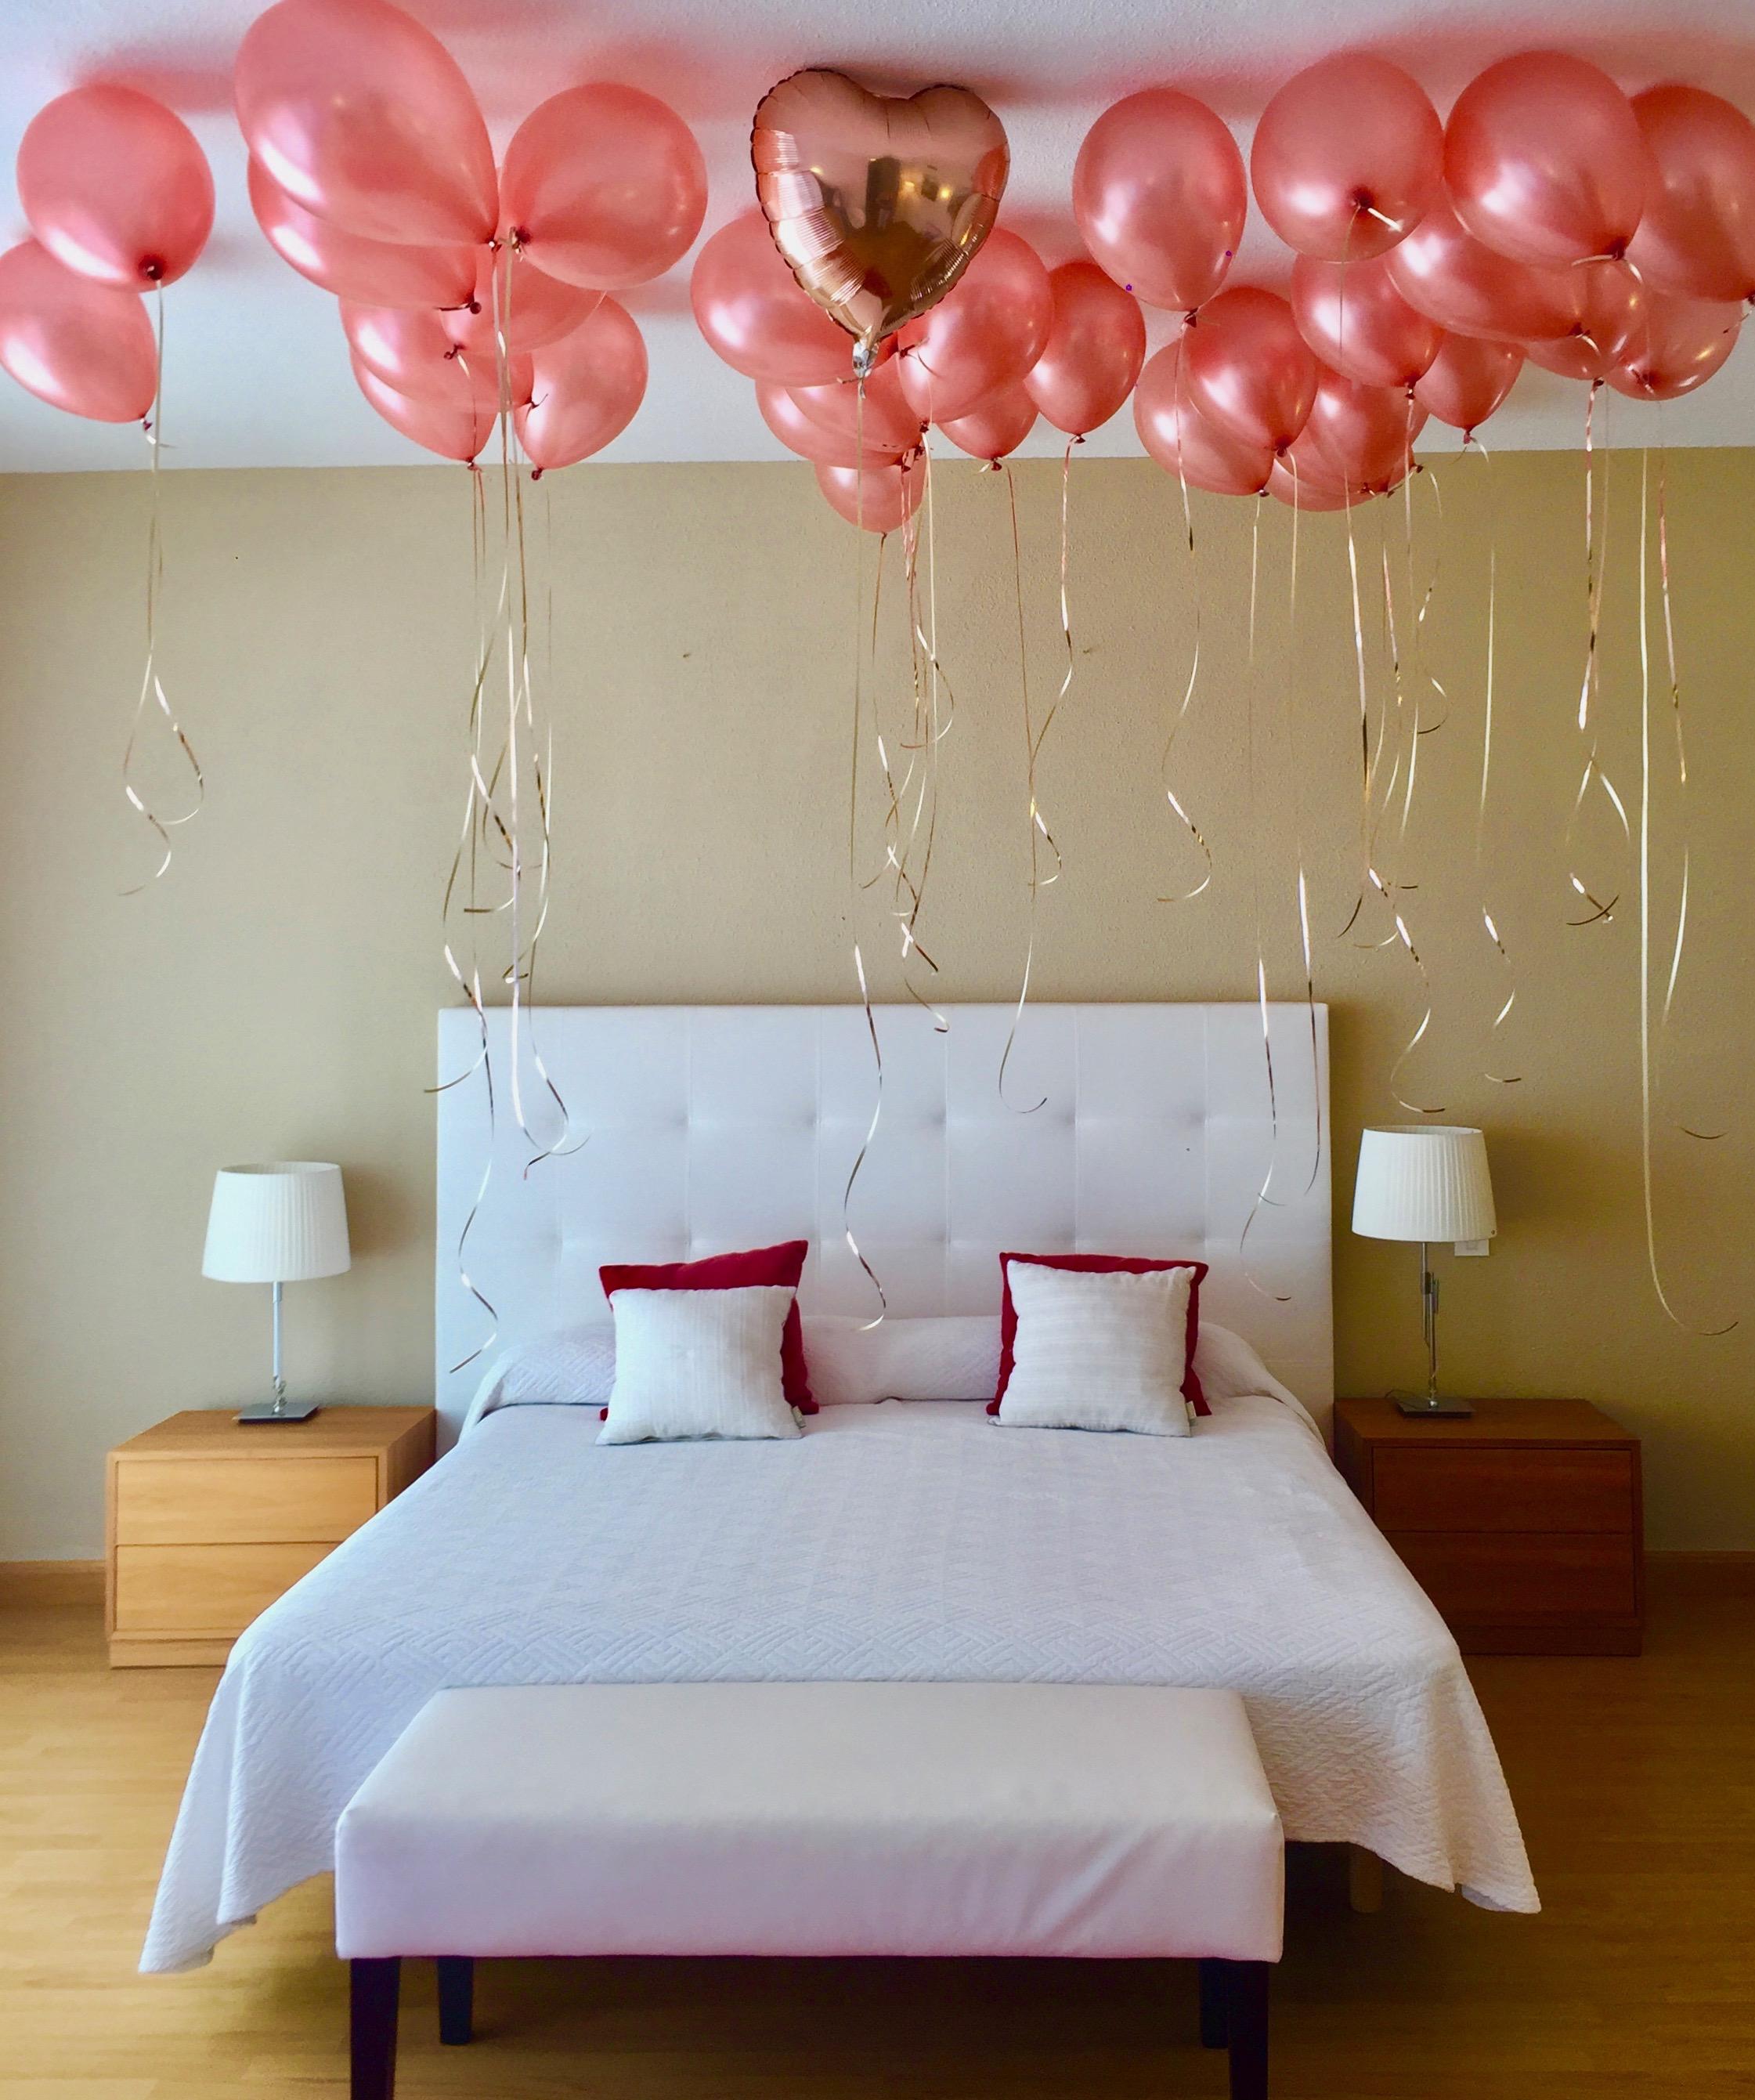 balloons marbella